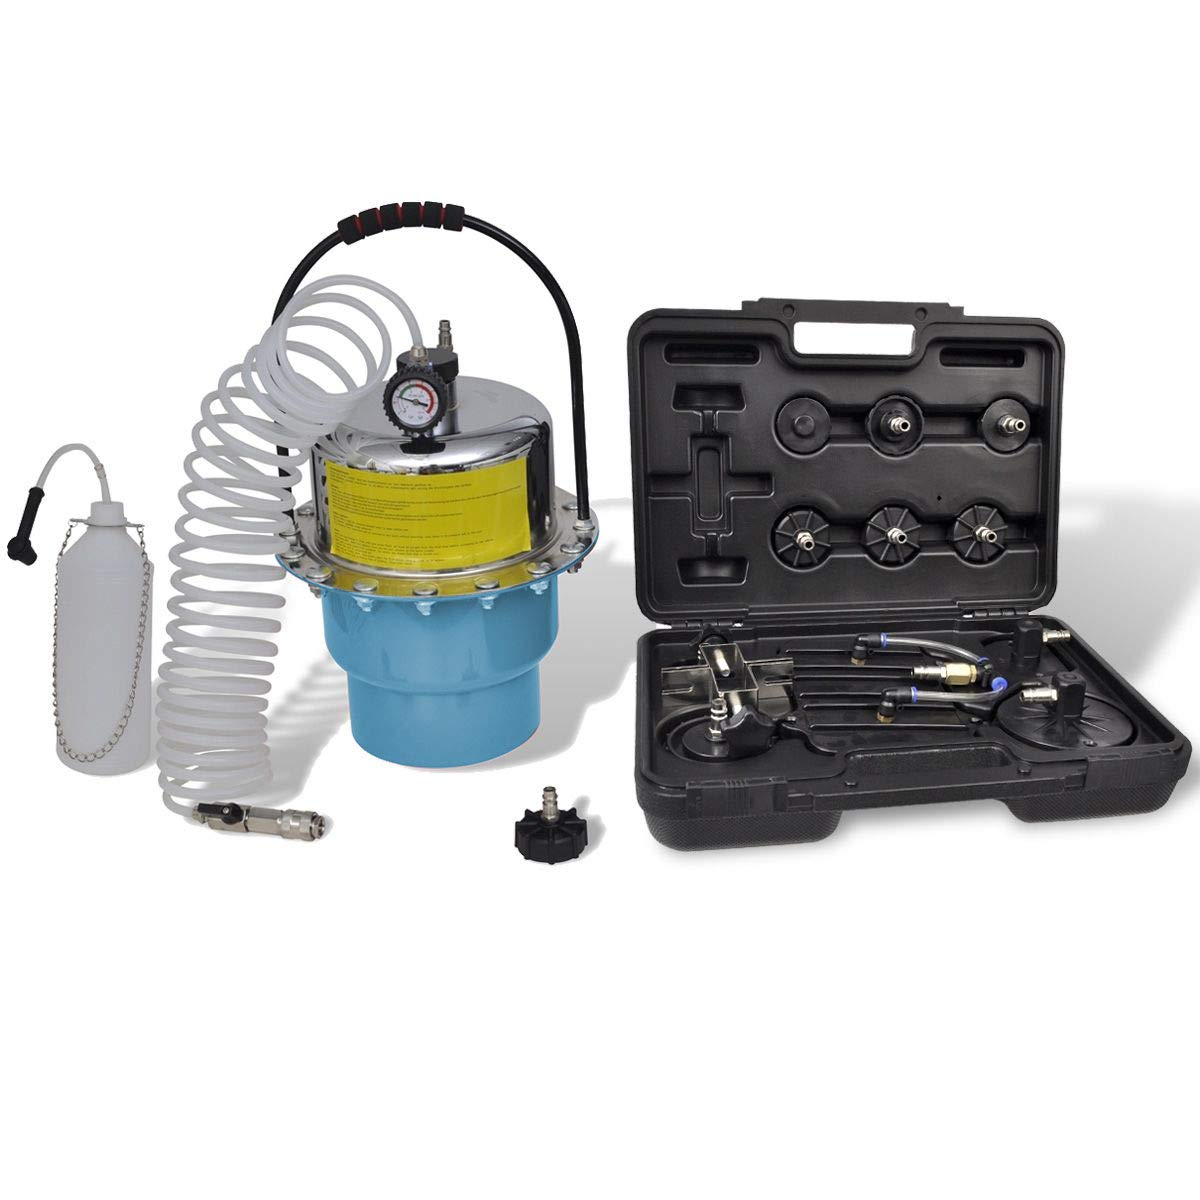 DA YUAN Portable Pneumatic Air Pressure Kit Brake and Clutch Bleeder Valve System Kit